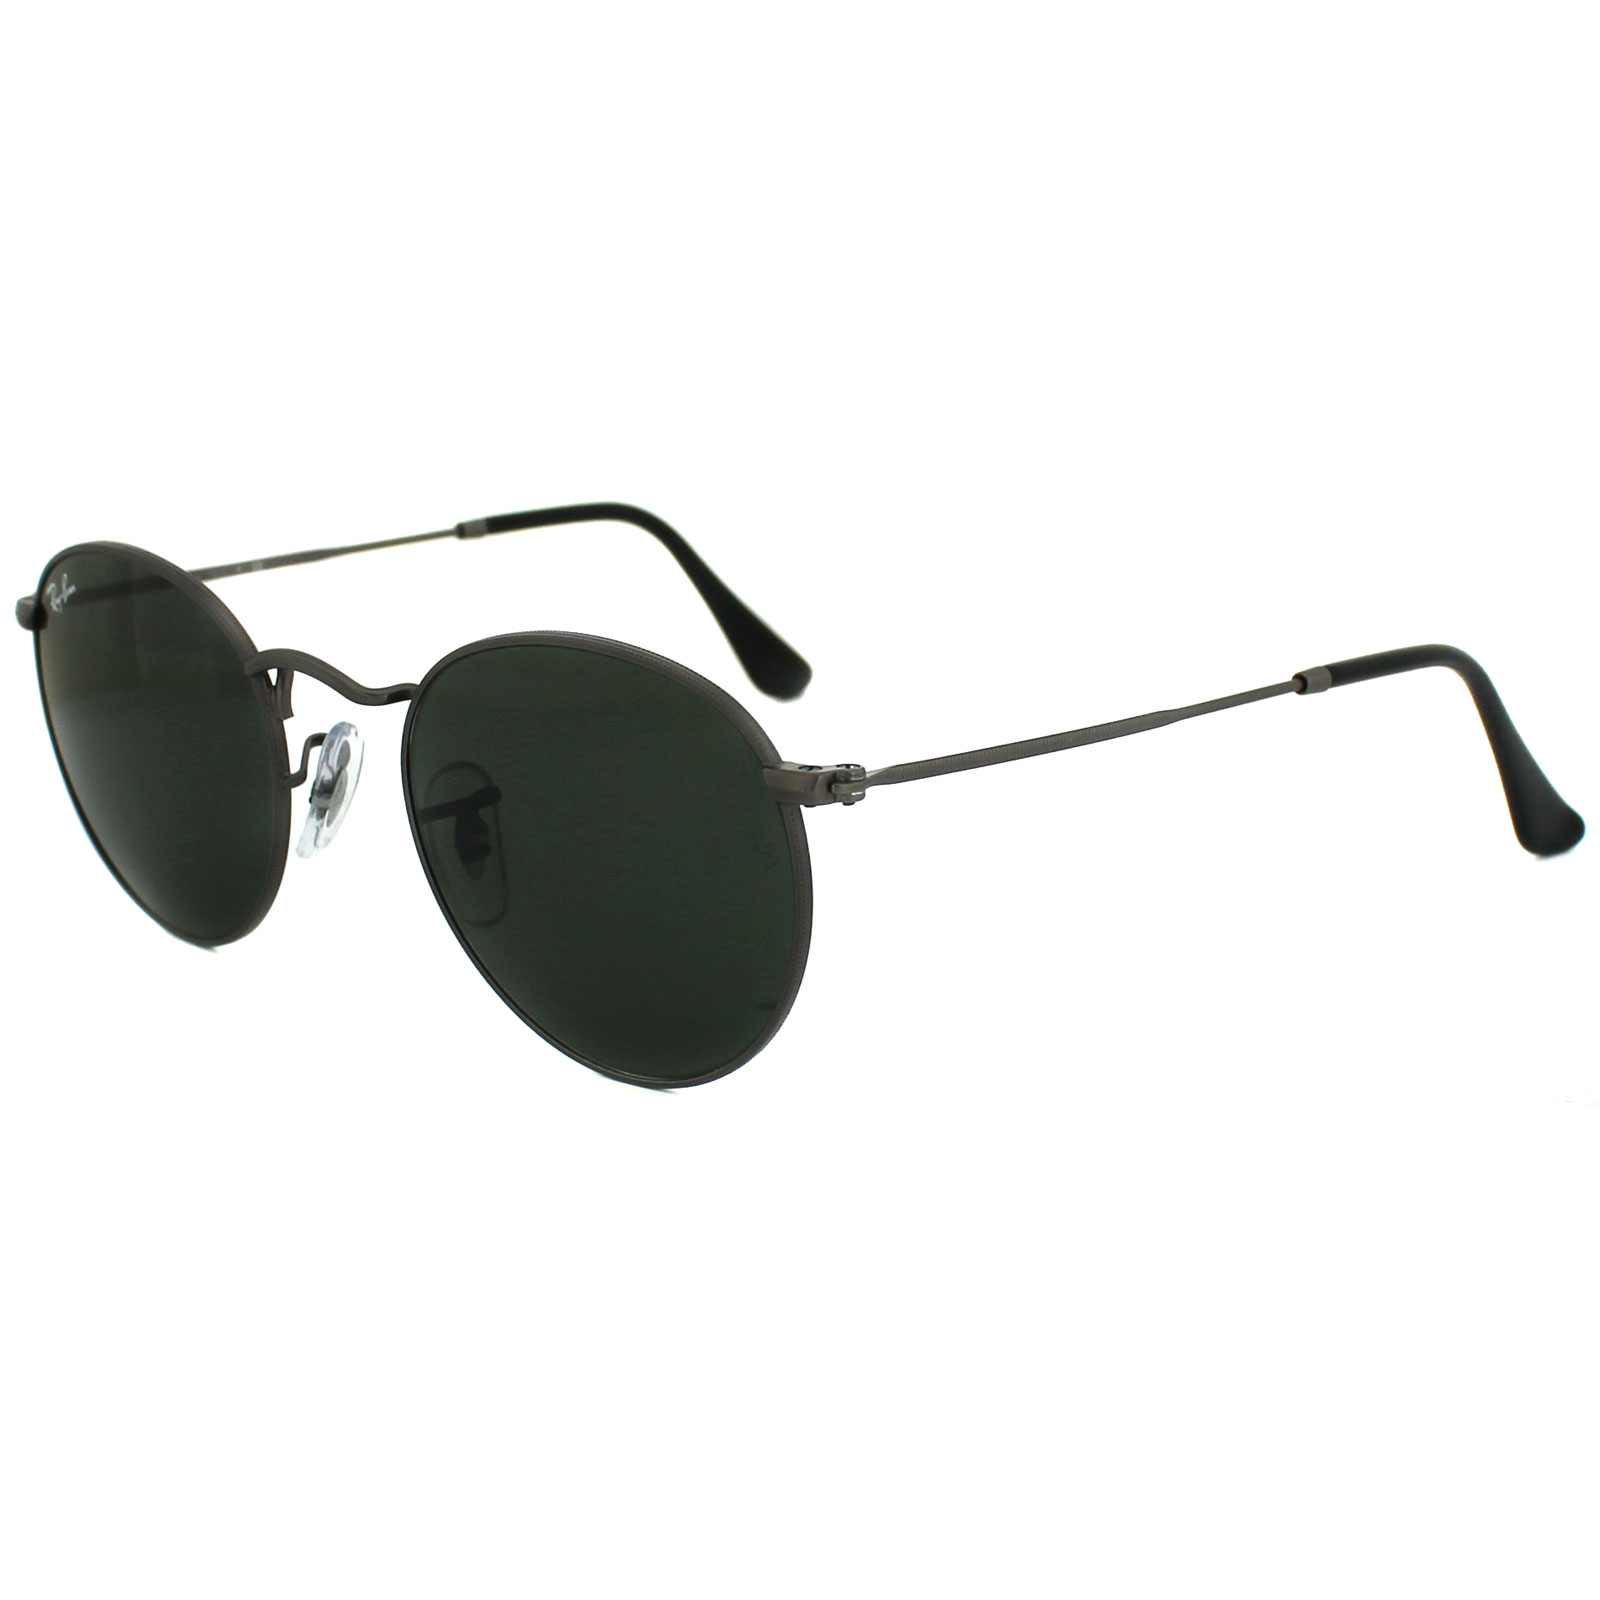 856828de8f ... discount code for sentinel ray ban sunglasses round metal 3447 029 matt  gunmetal green small 47mm